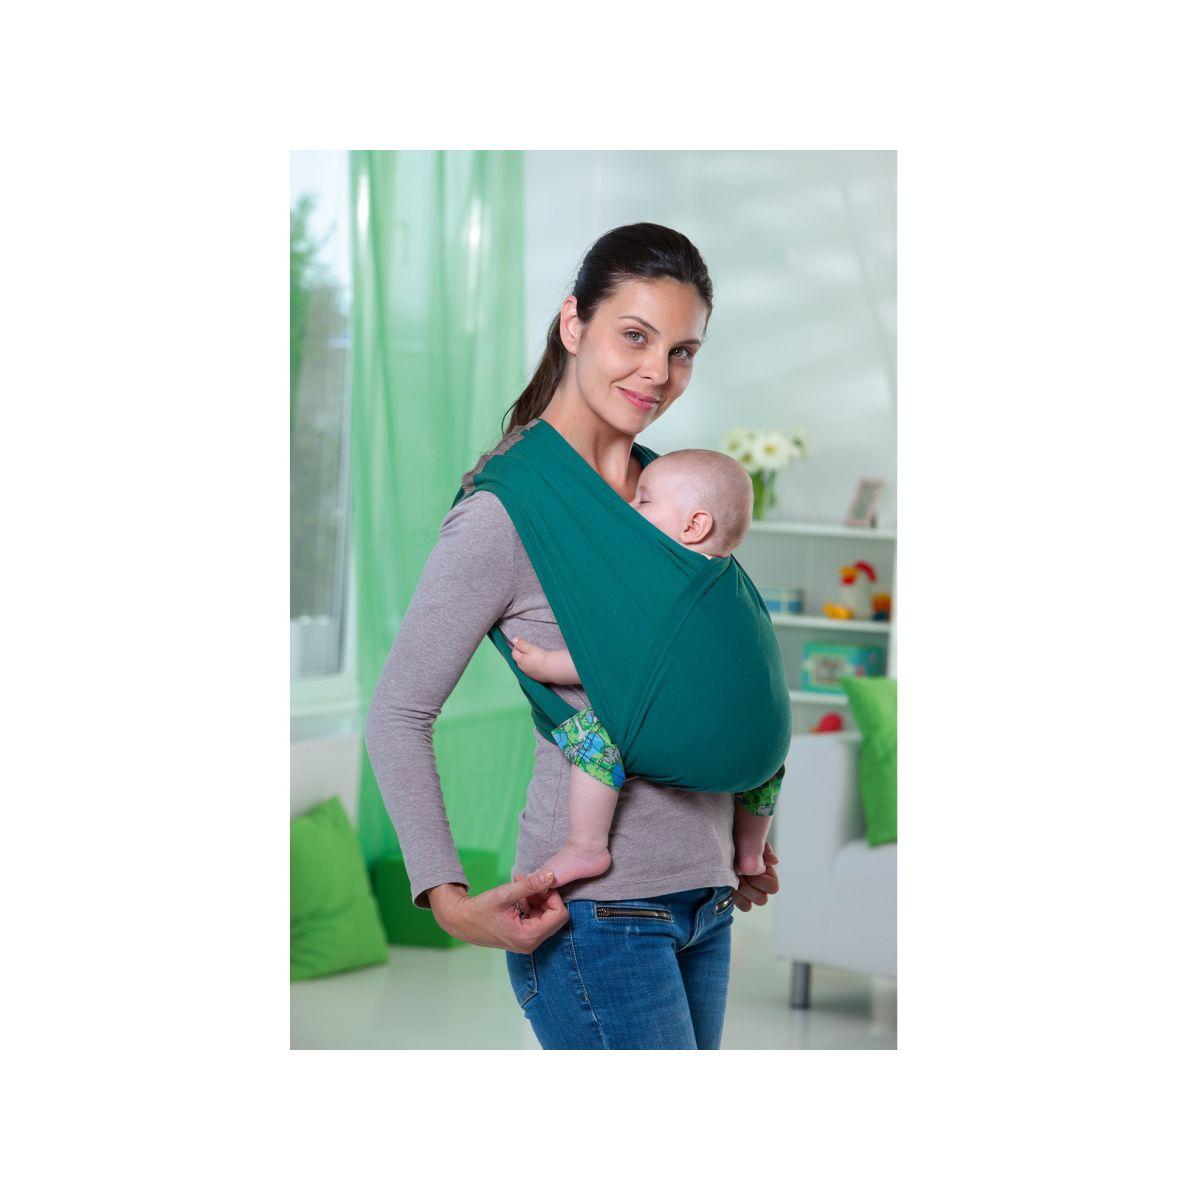 f48d1f736a6f AMAZONAS - Echarpe de portage sans noeud Carry Baby Petrol Acandi ...